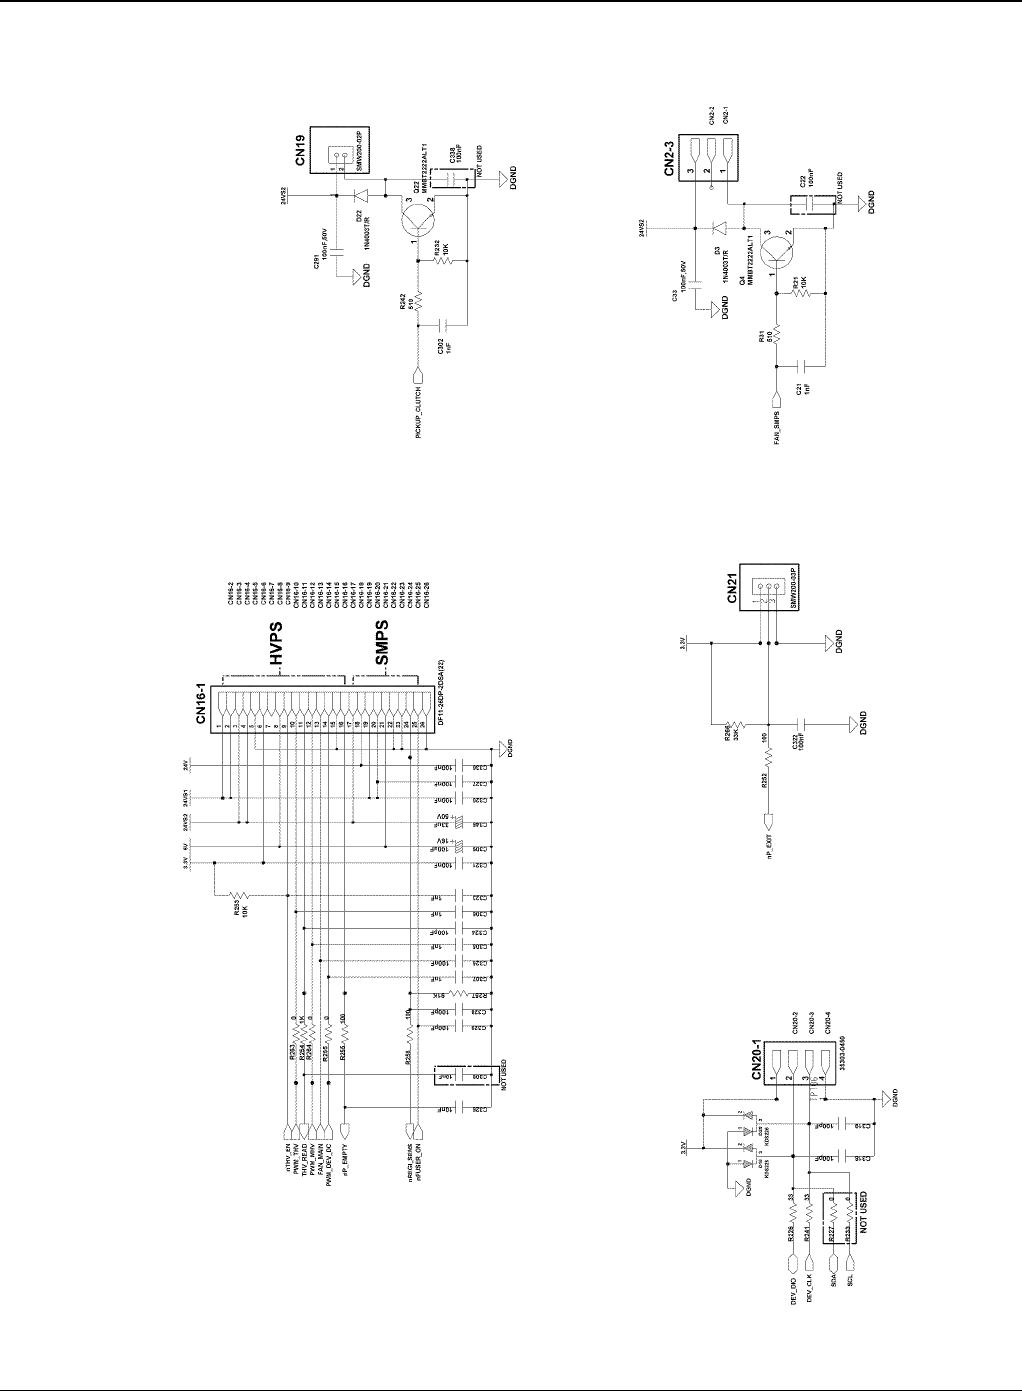 Xerox Phaser 3200MFP, WorkCentre PE220 Service Manual. Www